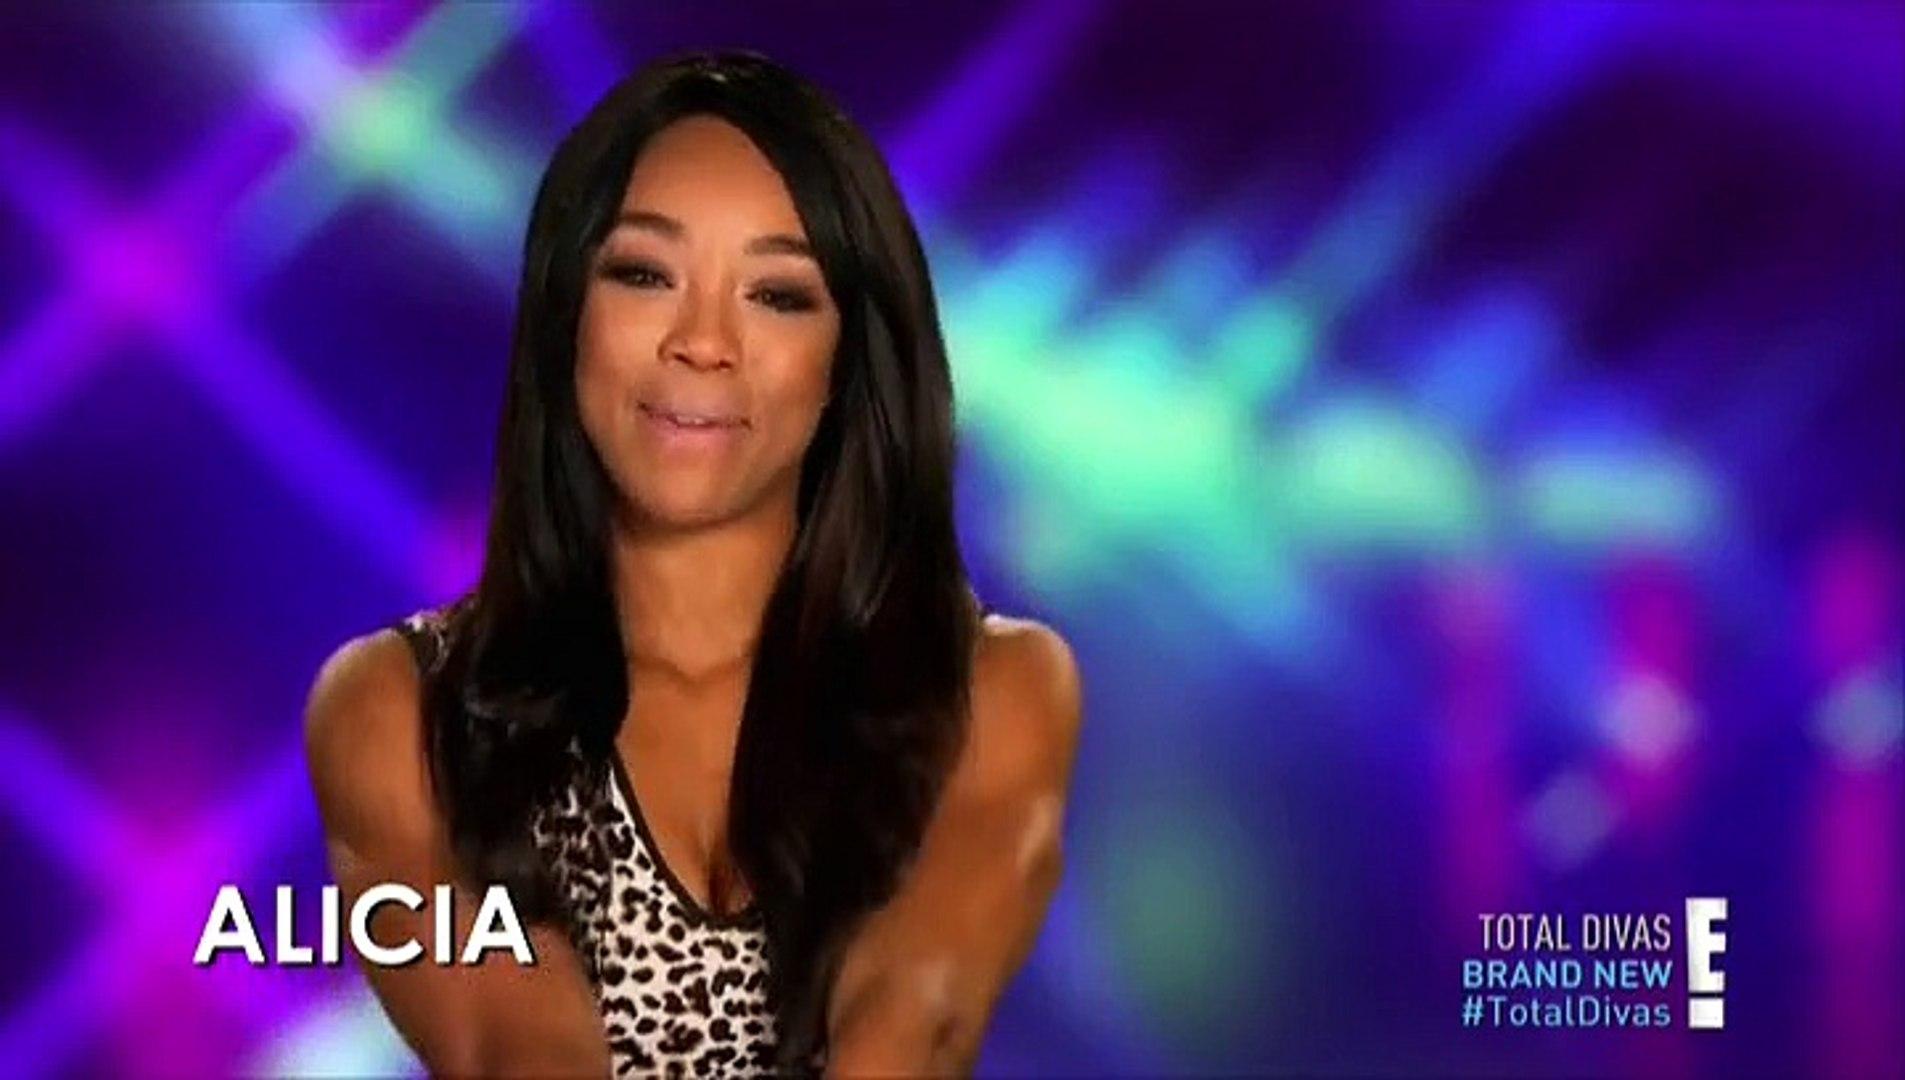 joka on Alicia Fox dating 2014